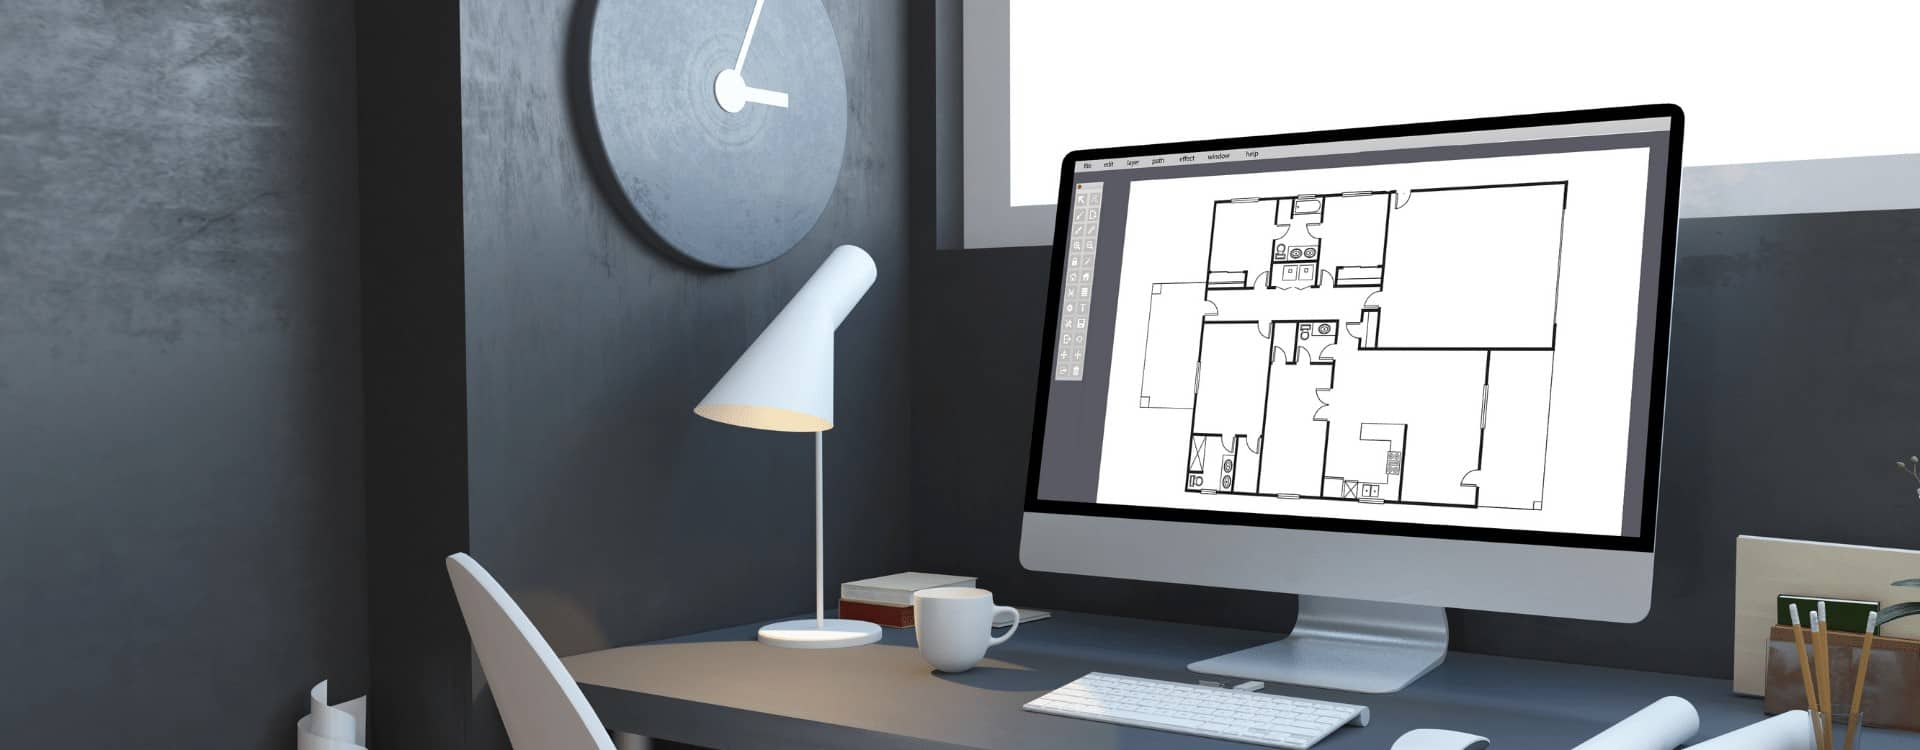 ordenador de mesa mostrando un plano de Ficherotecnia